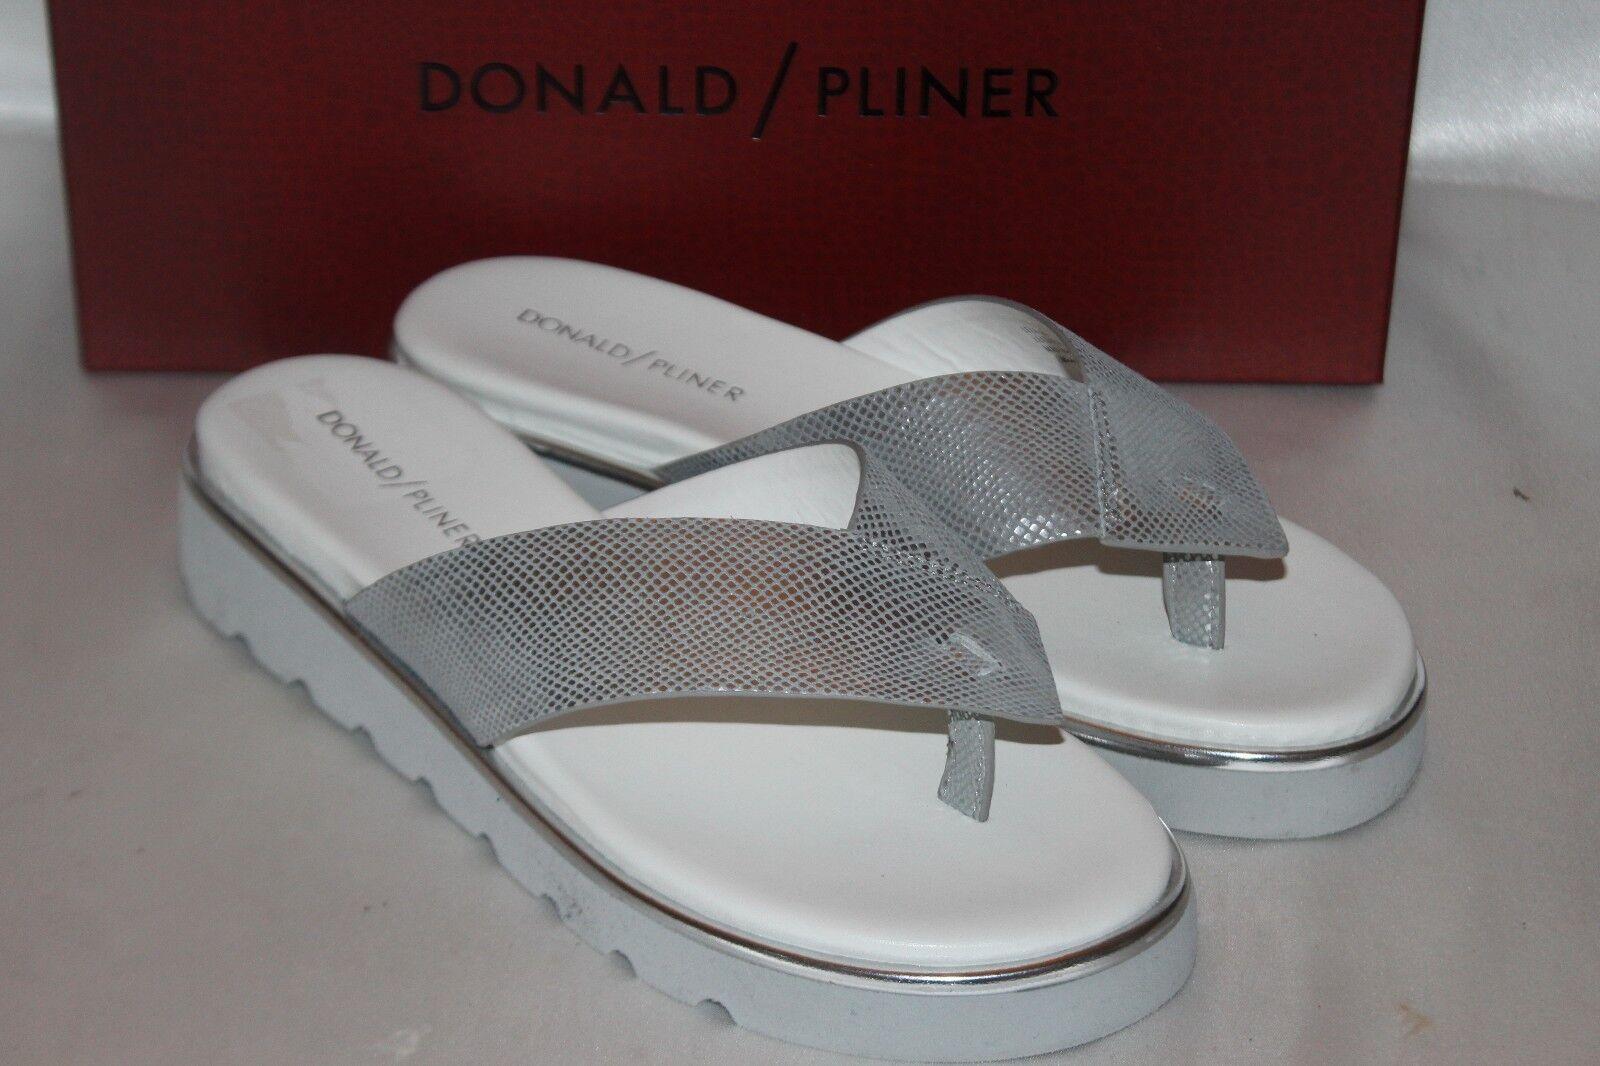 NEW  Donald J Pliner VIPERINA Silver Leather Flip Flop Thong Wedge Sandal  178